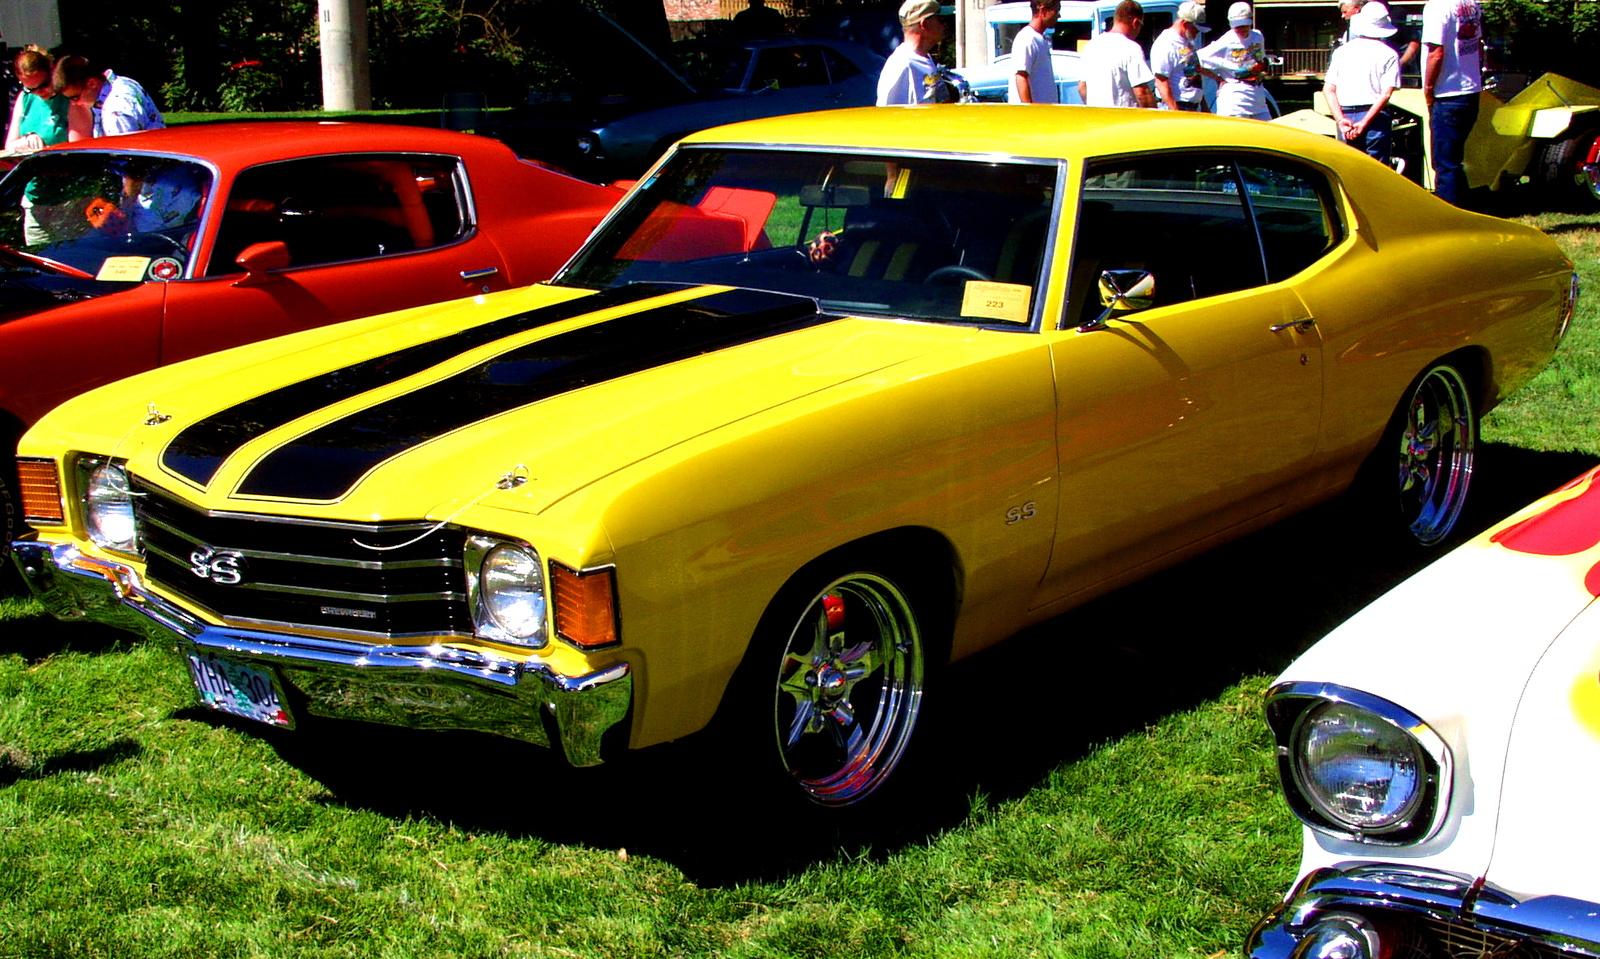 1970 Chevelle Ss Sale Craigslist